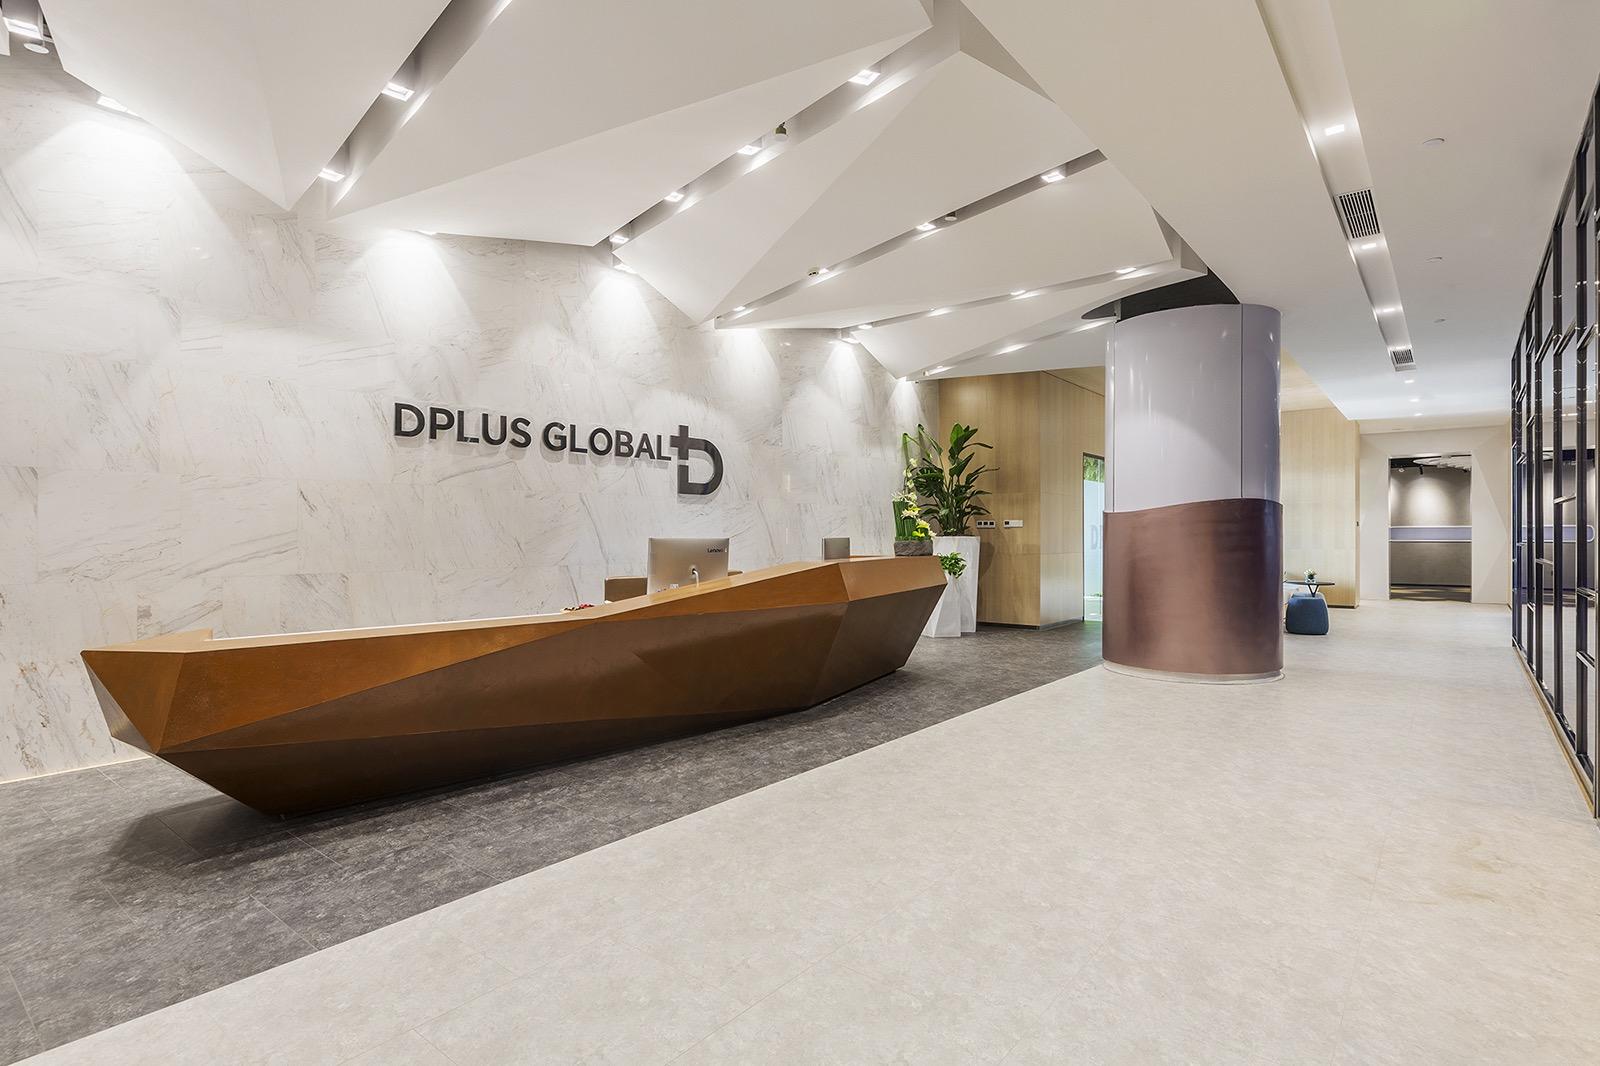 dplus-global-office-2